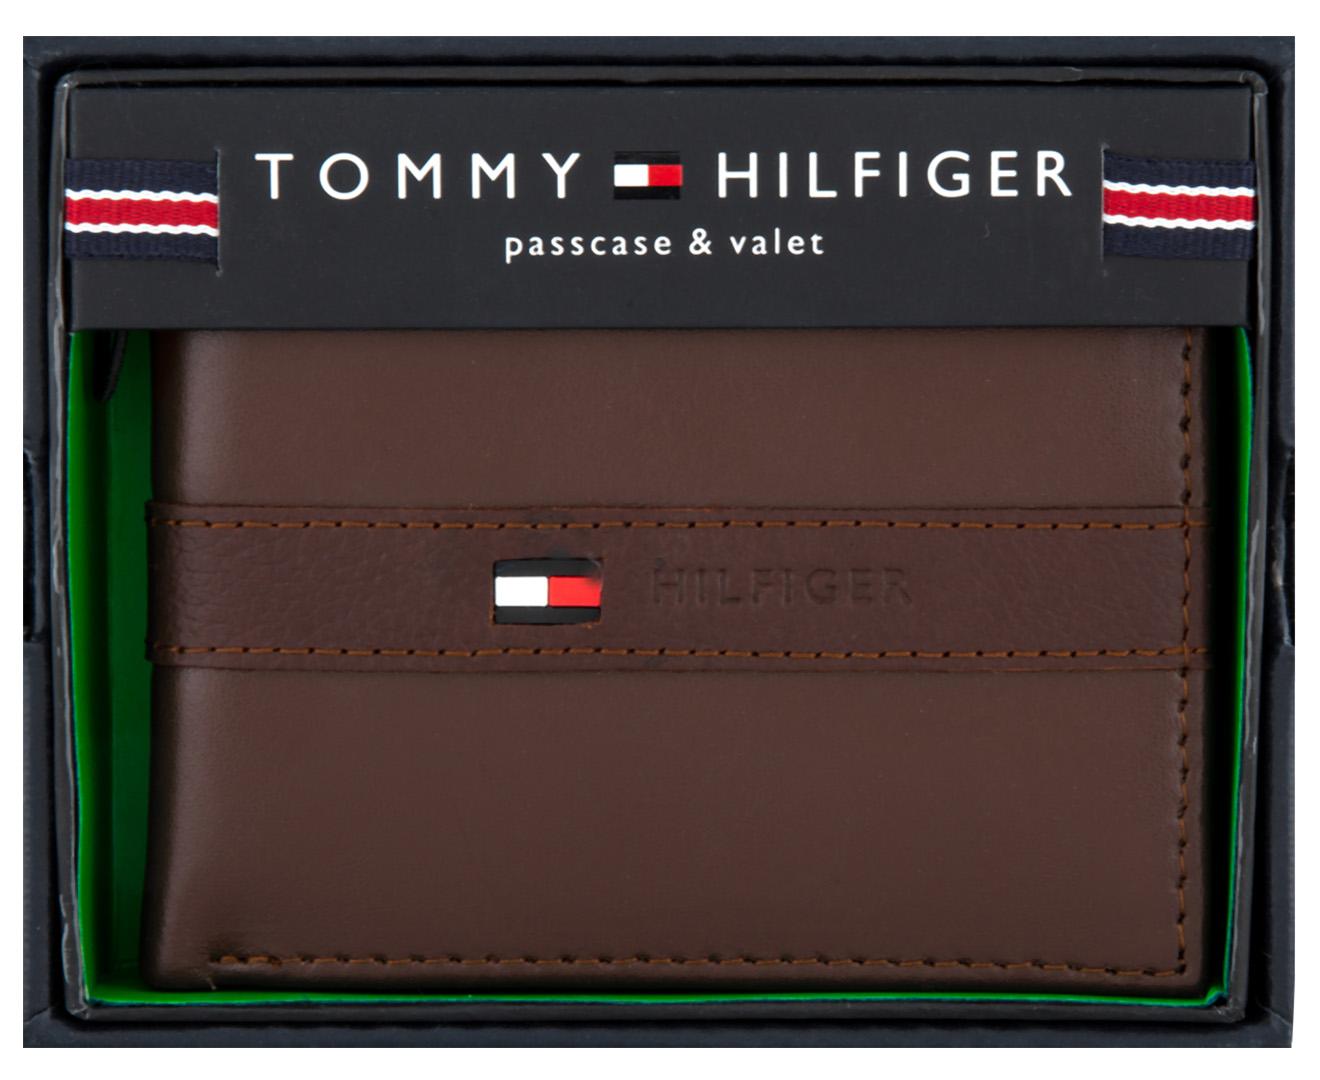 be4c41617109 Tommy Hilfiger Ranger Passcase Billfold Wallet - Cognac